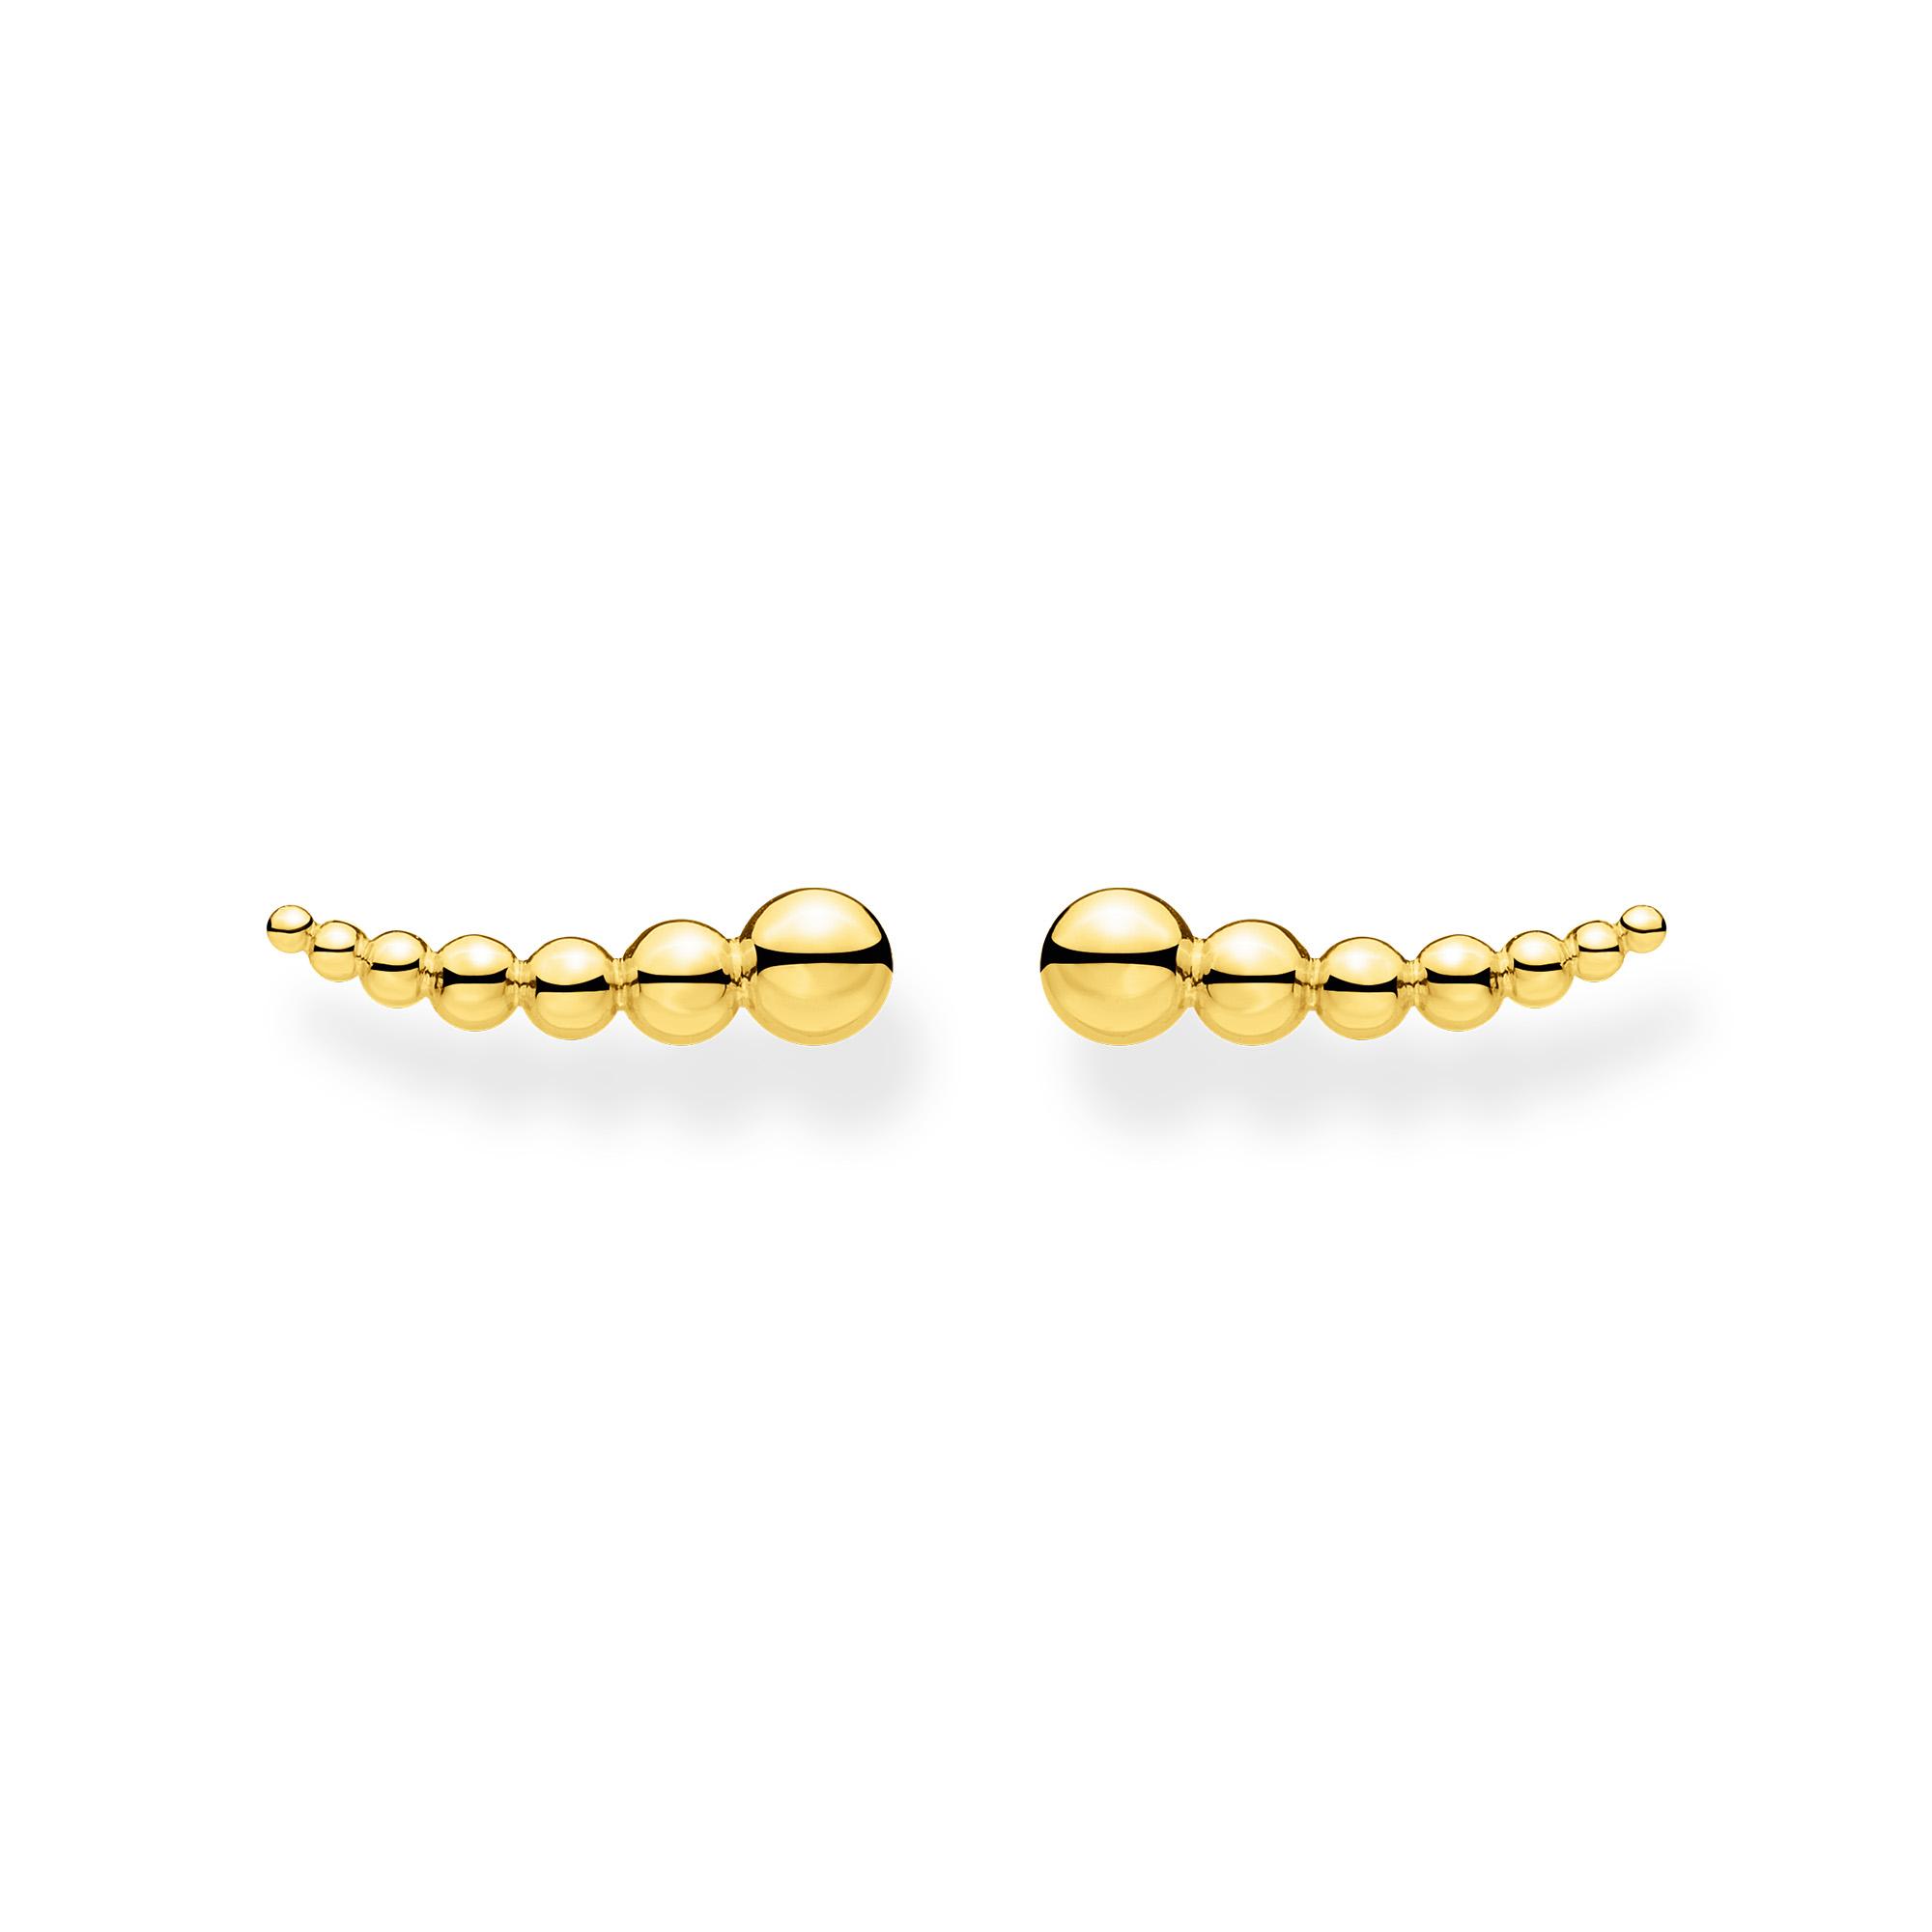 Boucles d'oreilles grimpante perles or, Thomas Sabo